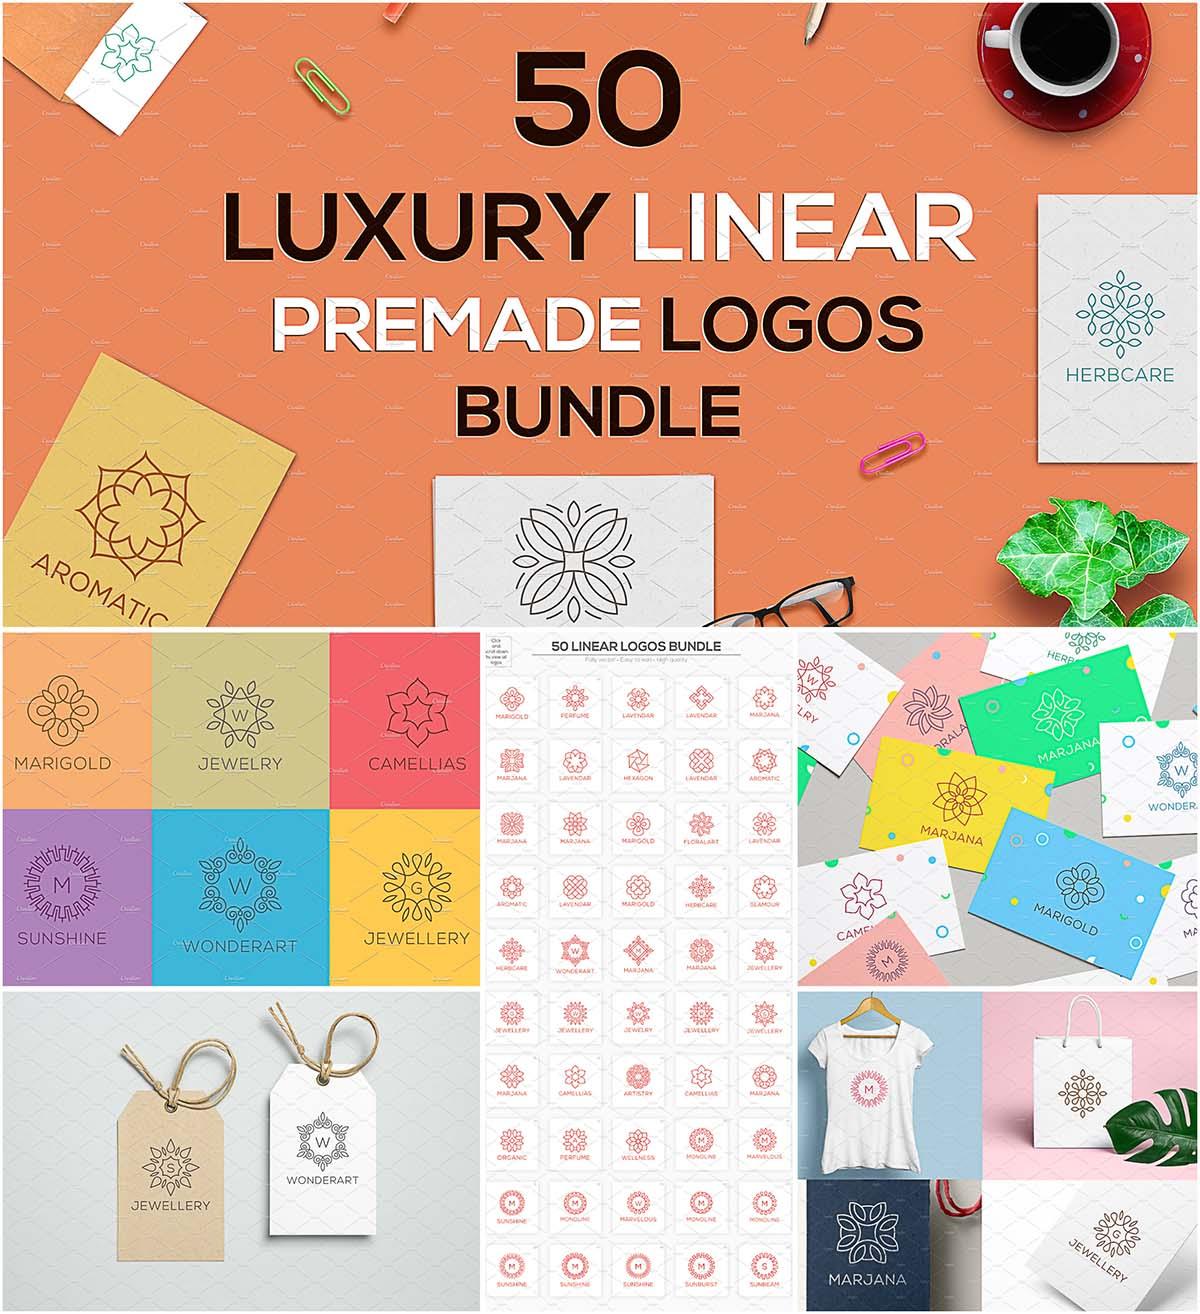 Luxury linear premade logos